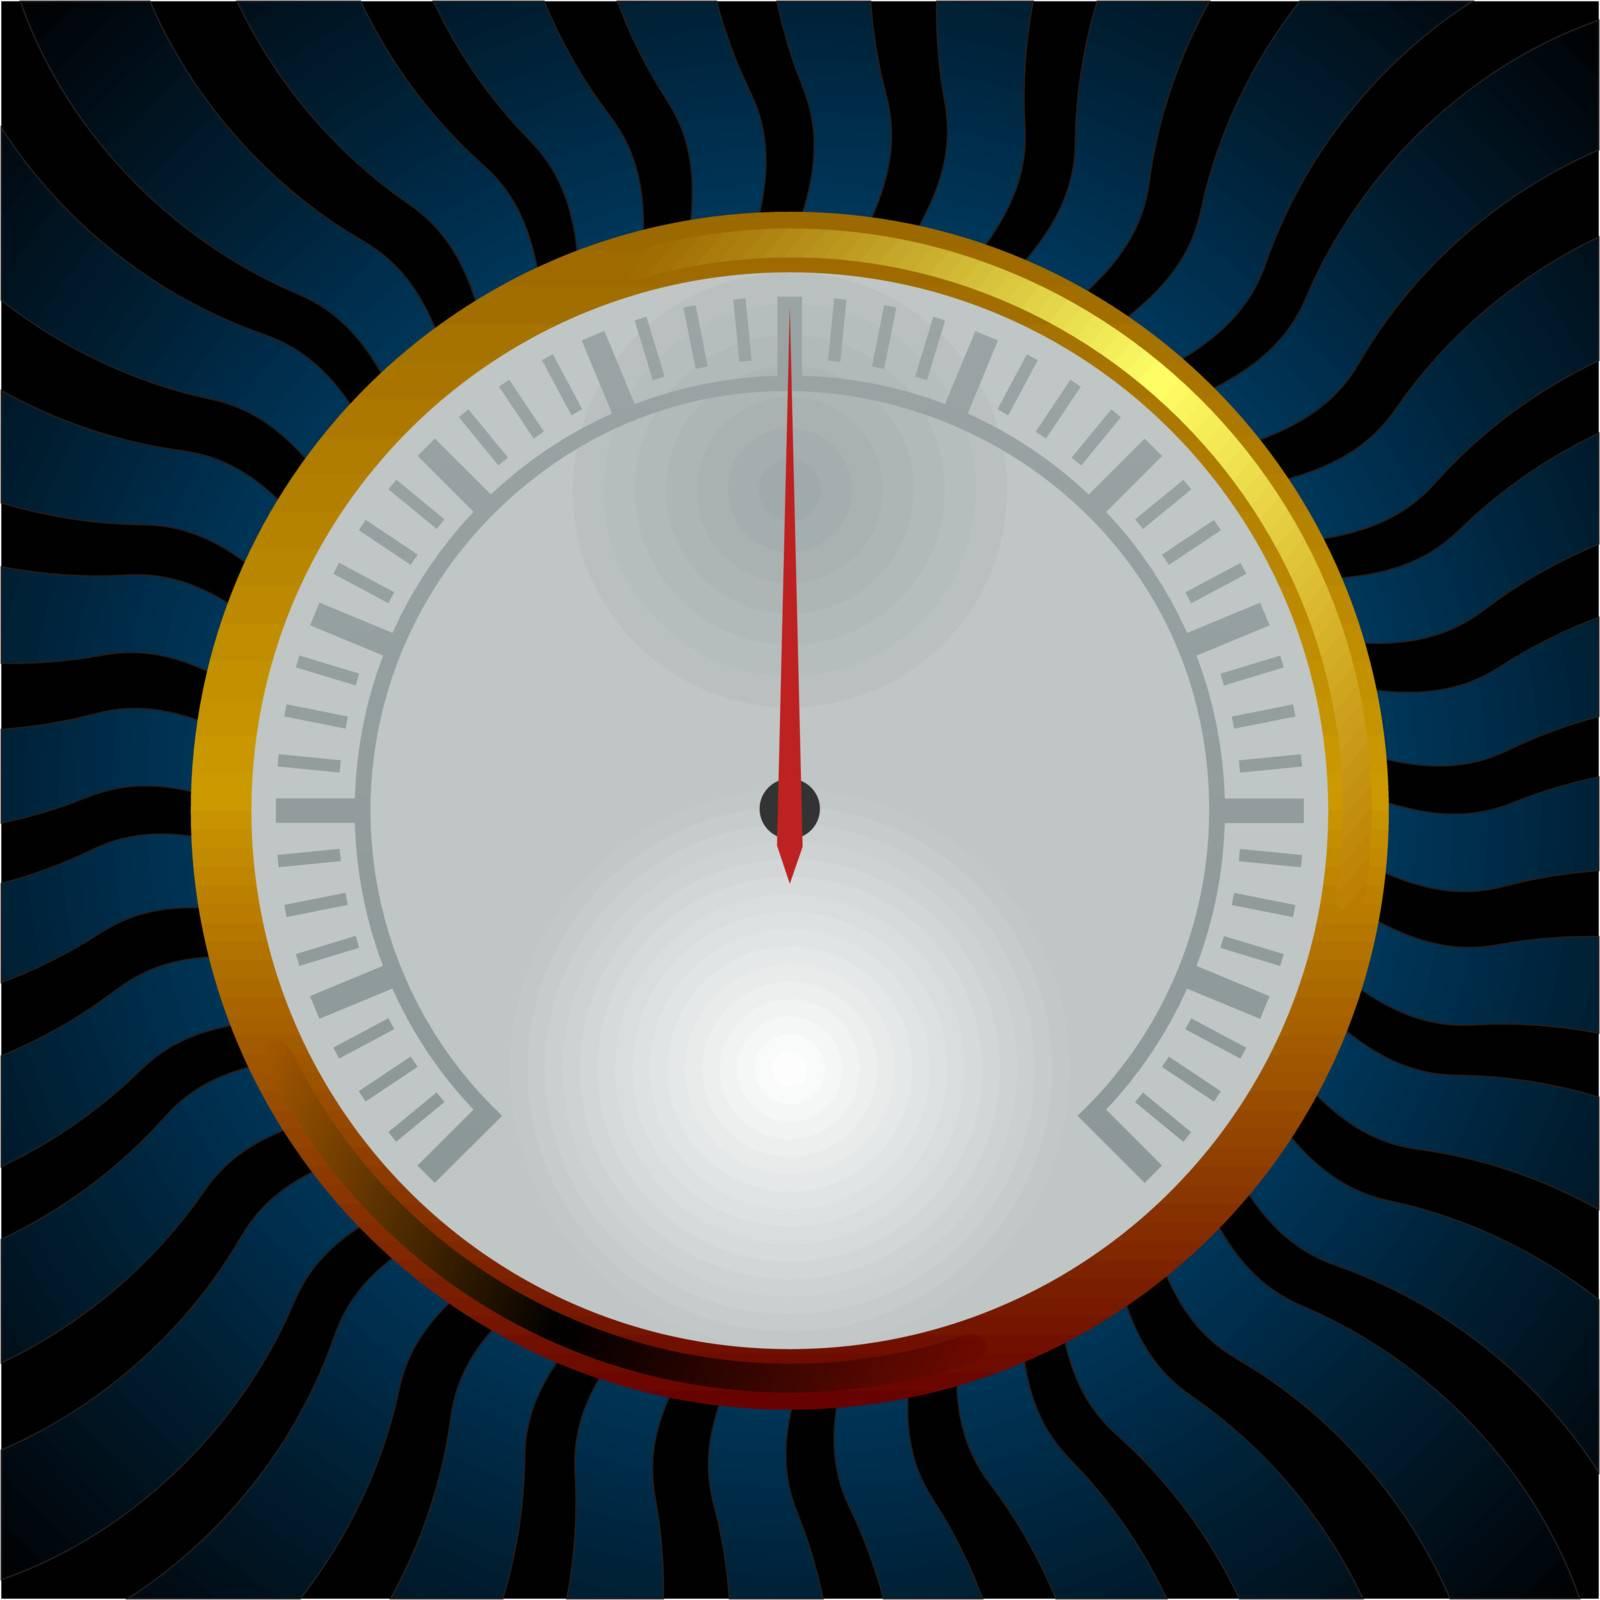 photo realistic Analog gauge